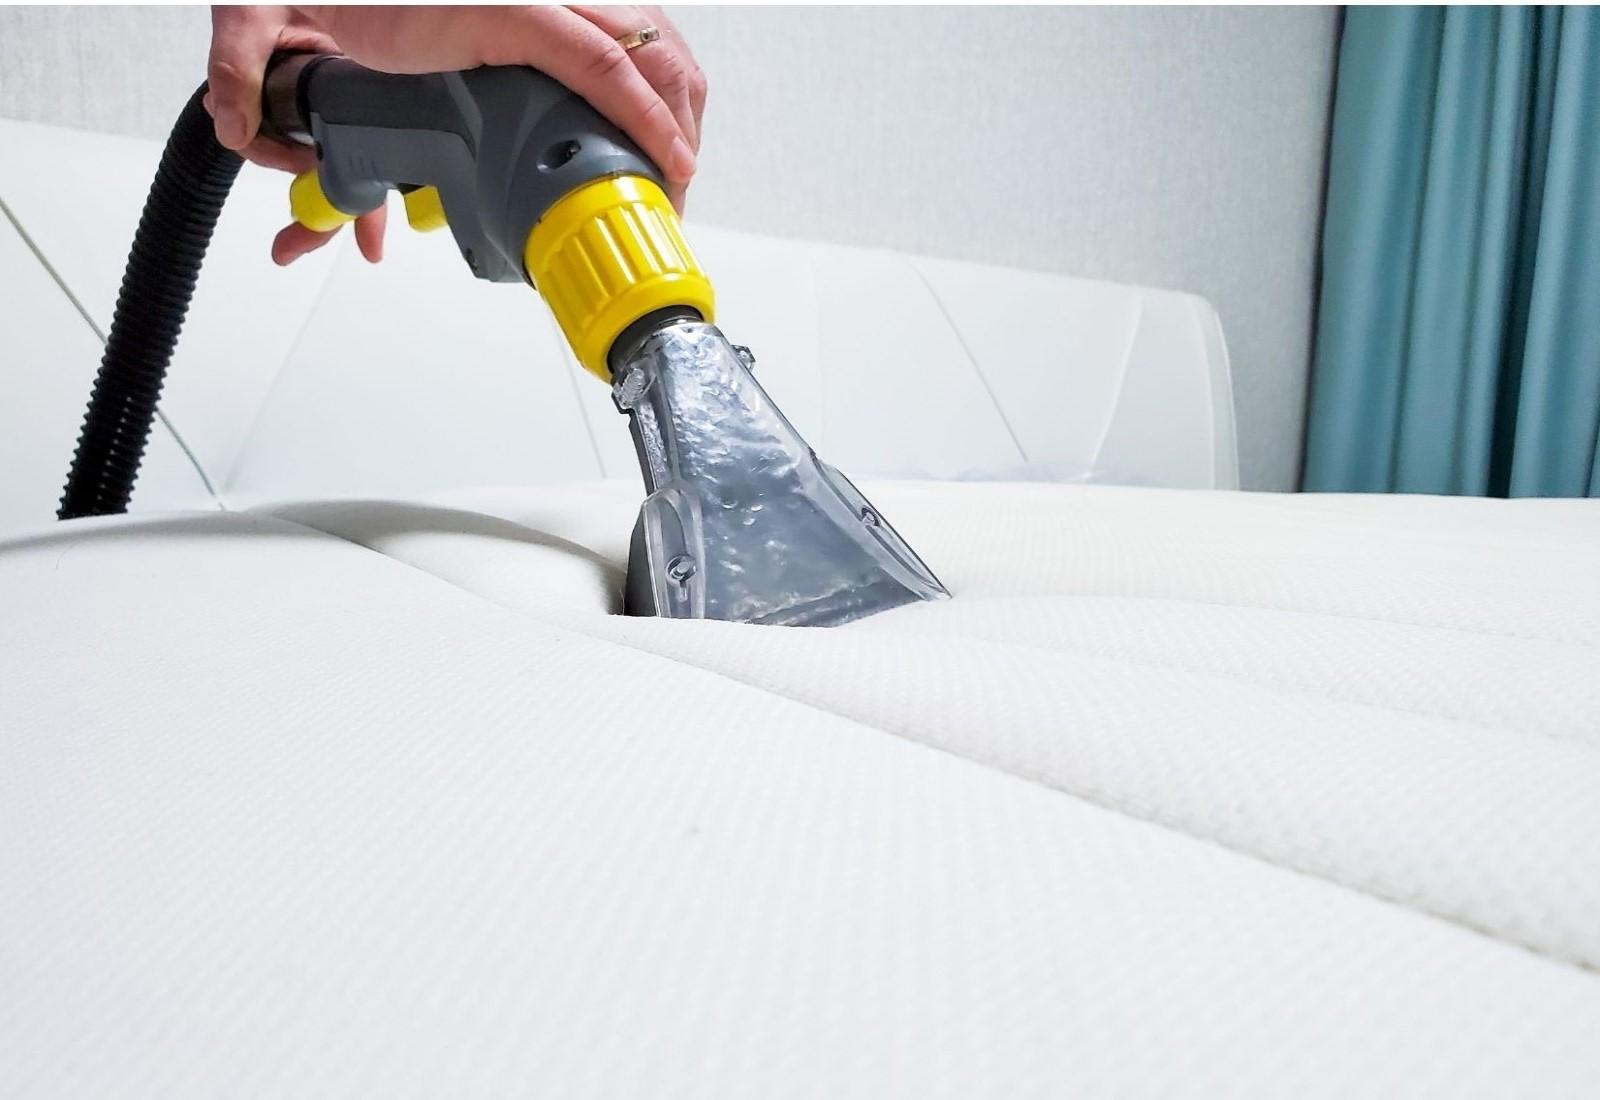 Residential Mattress Cleaning Sanitizing